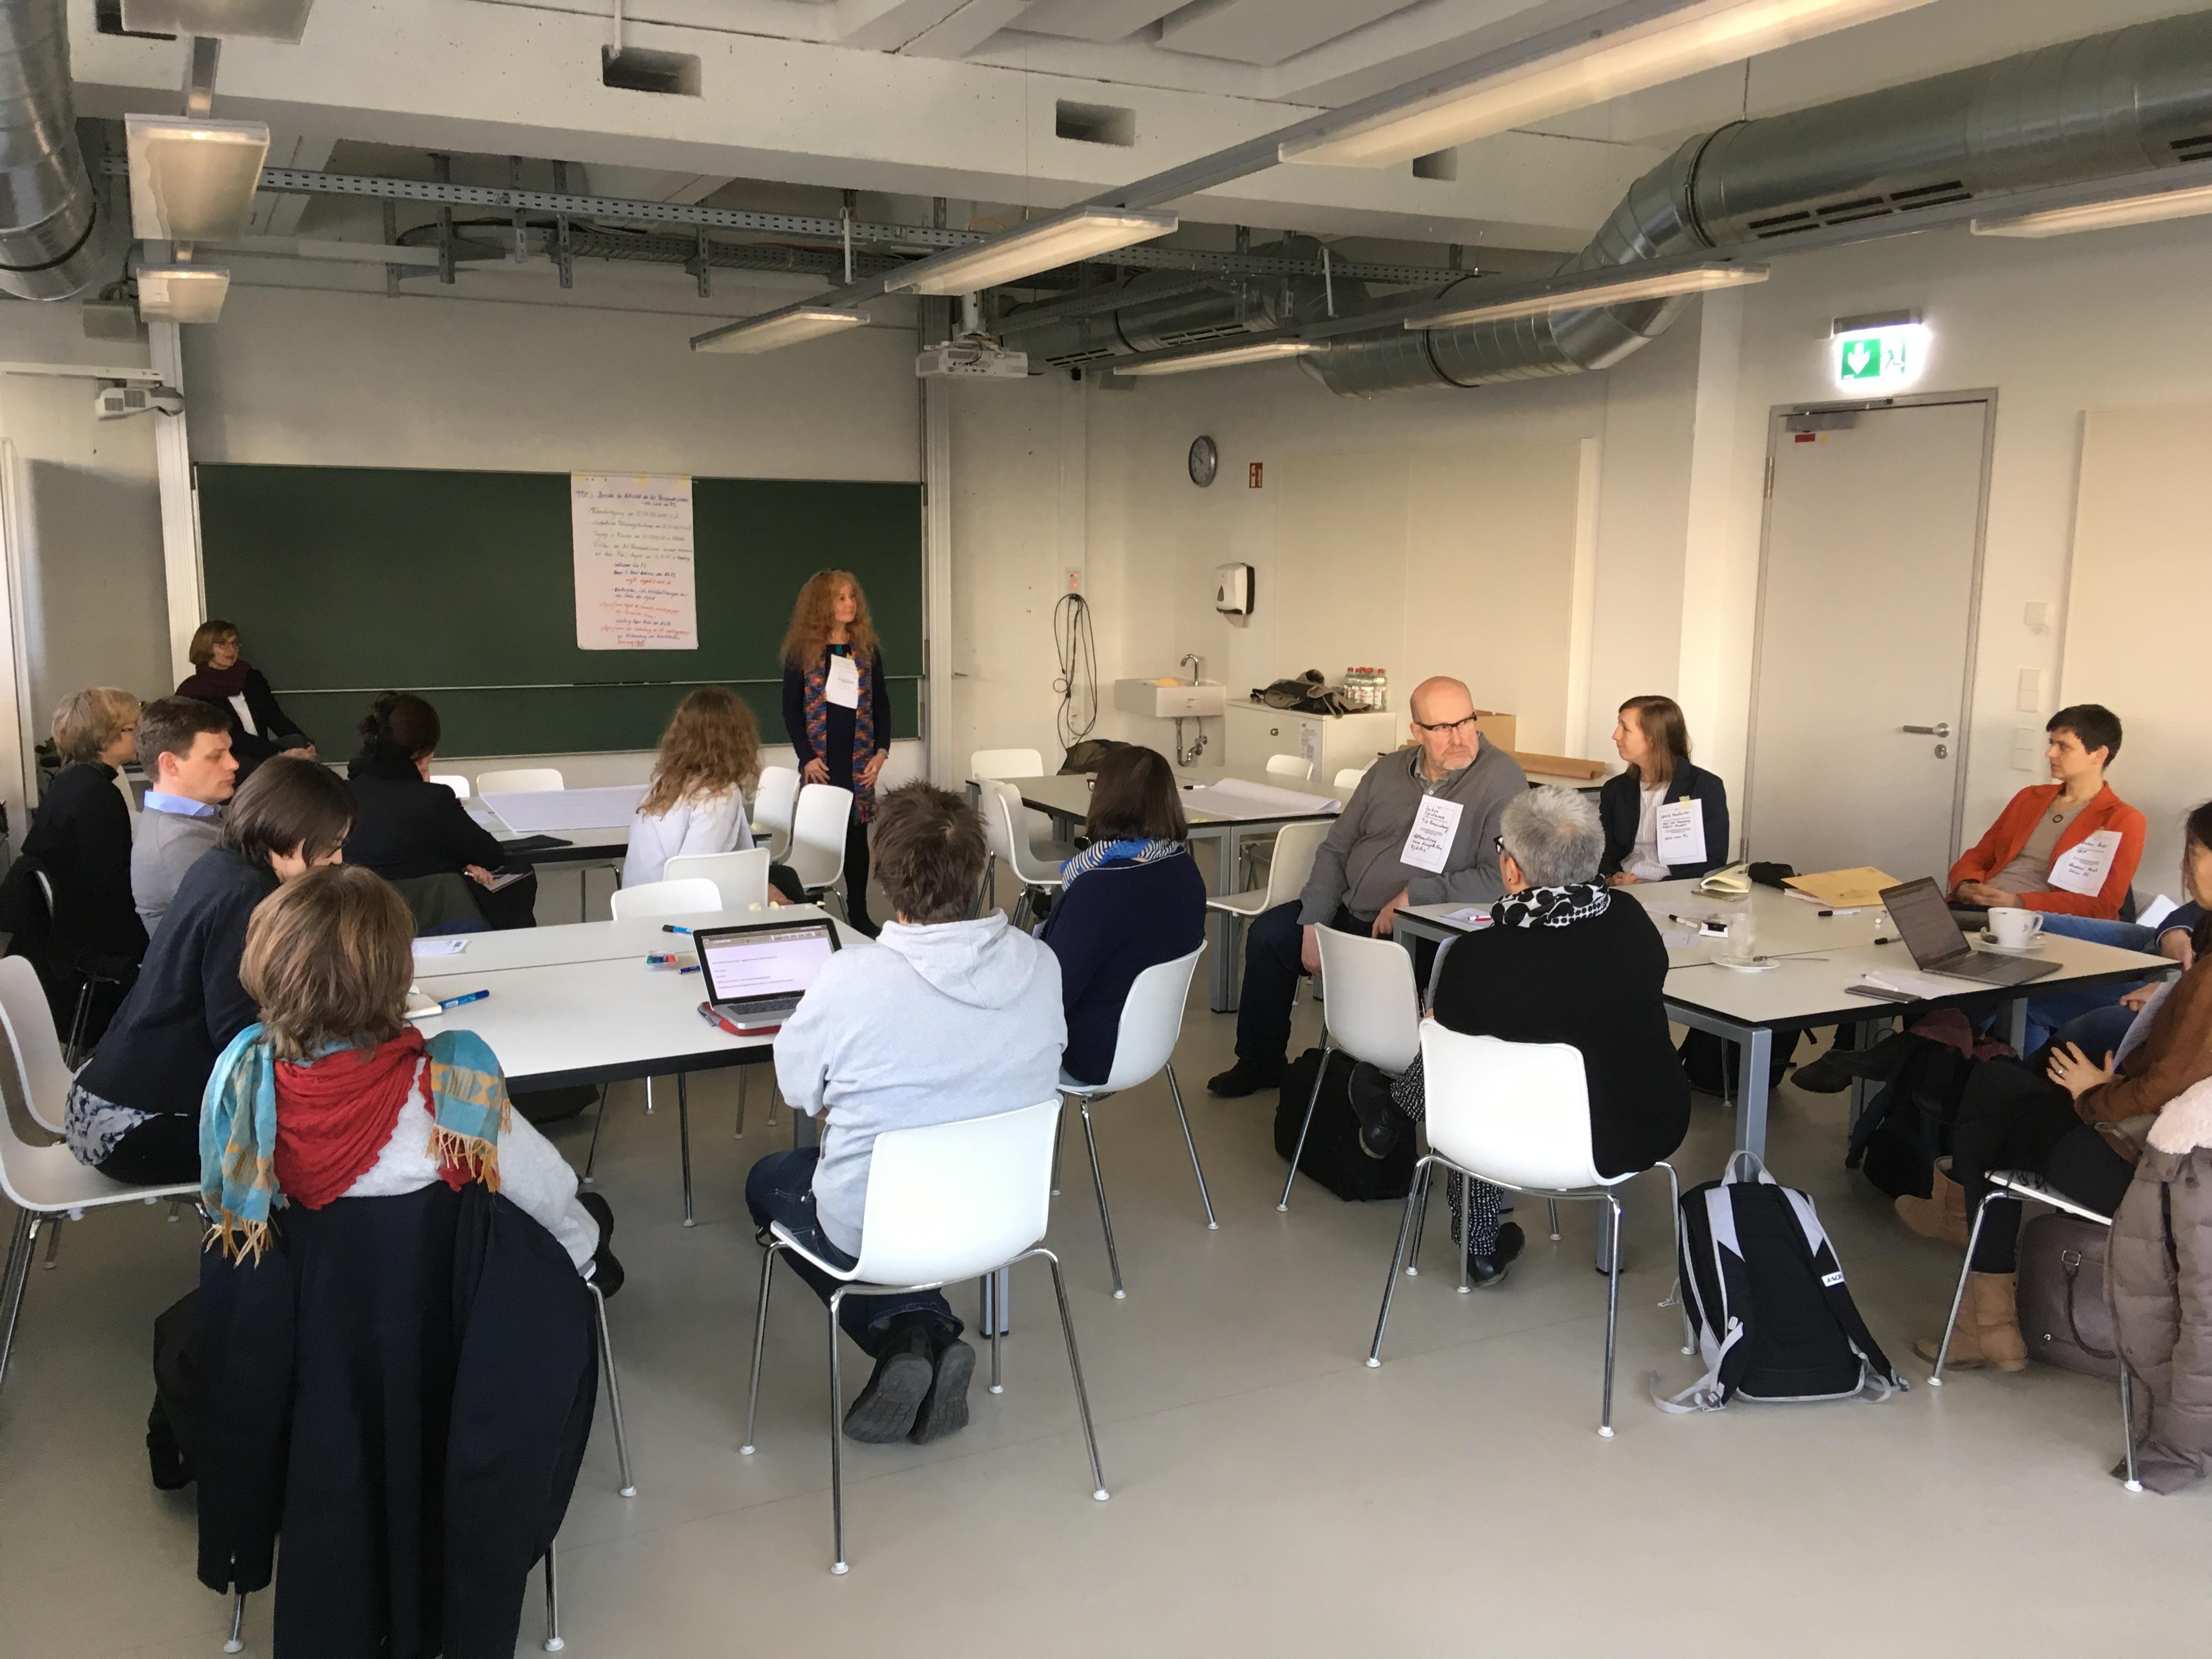 Preconference Der AG Forschendes Lernen In Der Dghd Am 28.02.2018